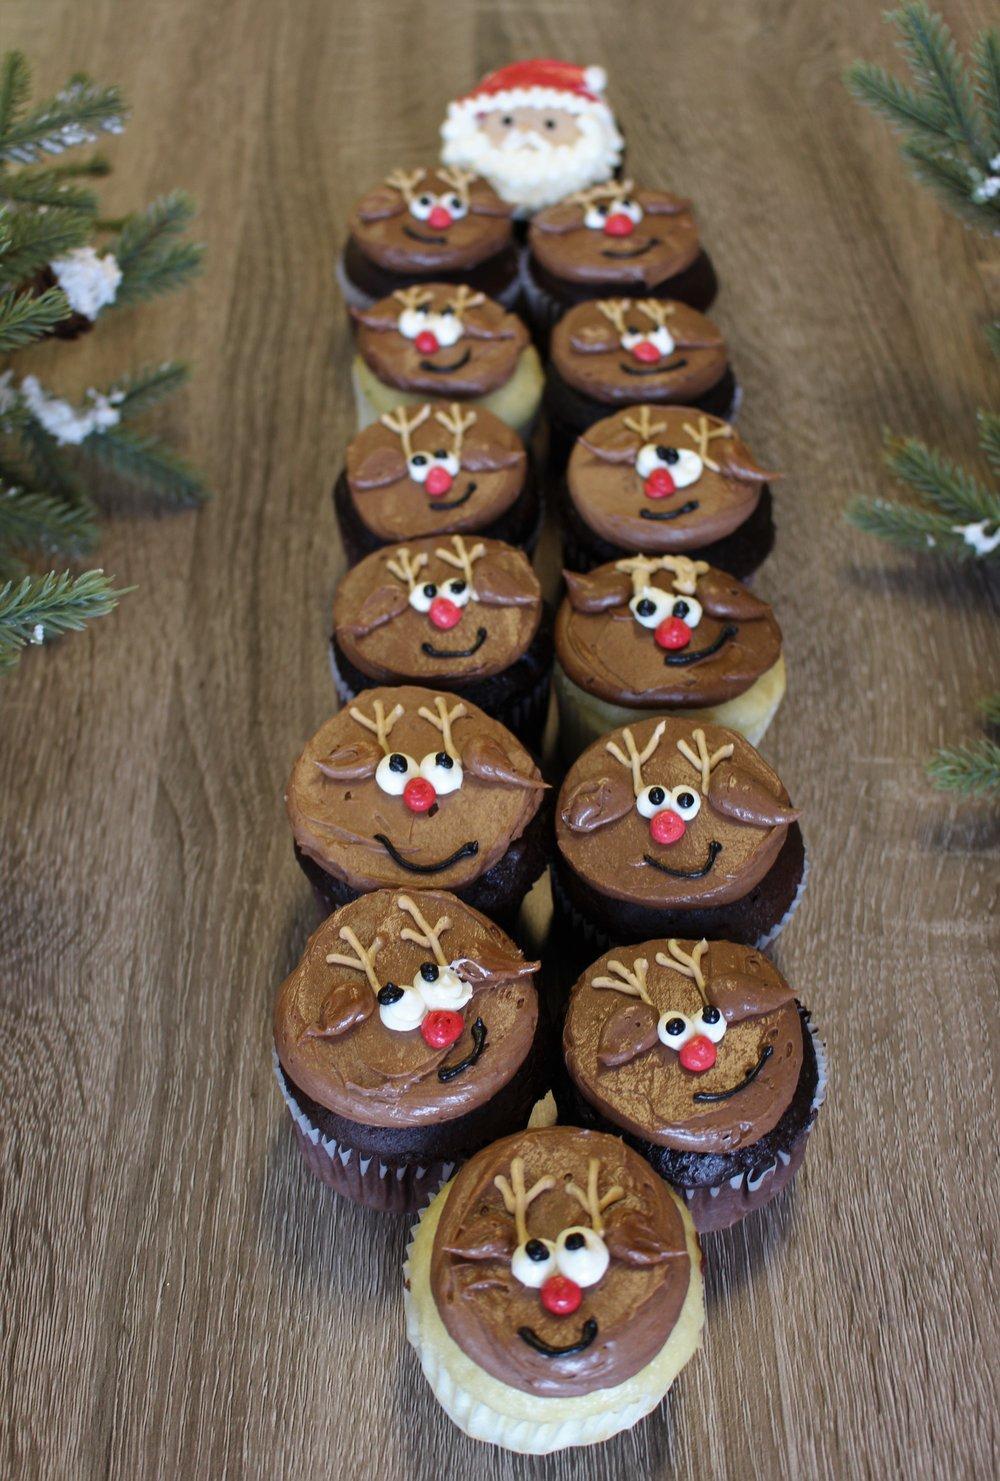 Santa and His Reindeer Cupcakes